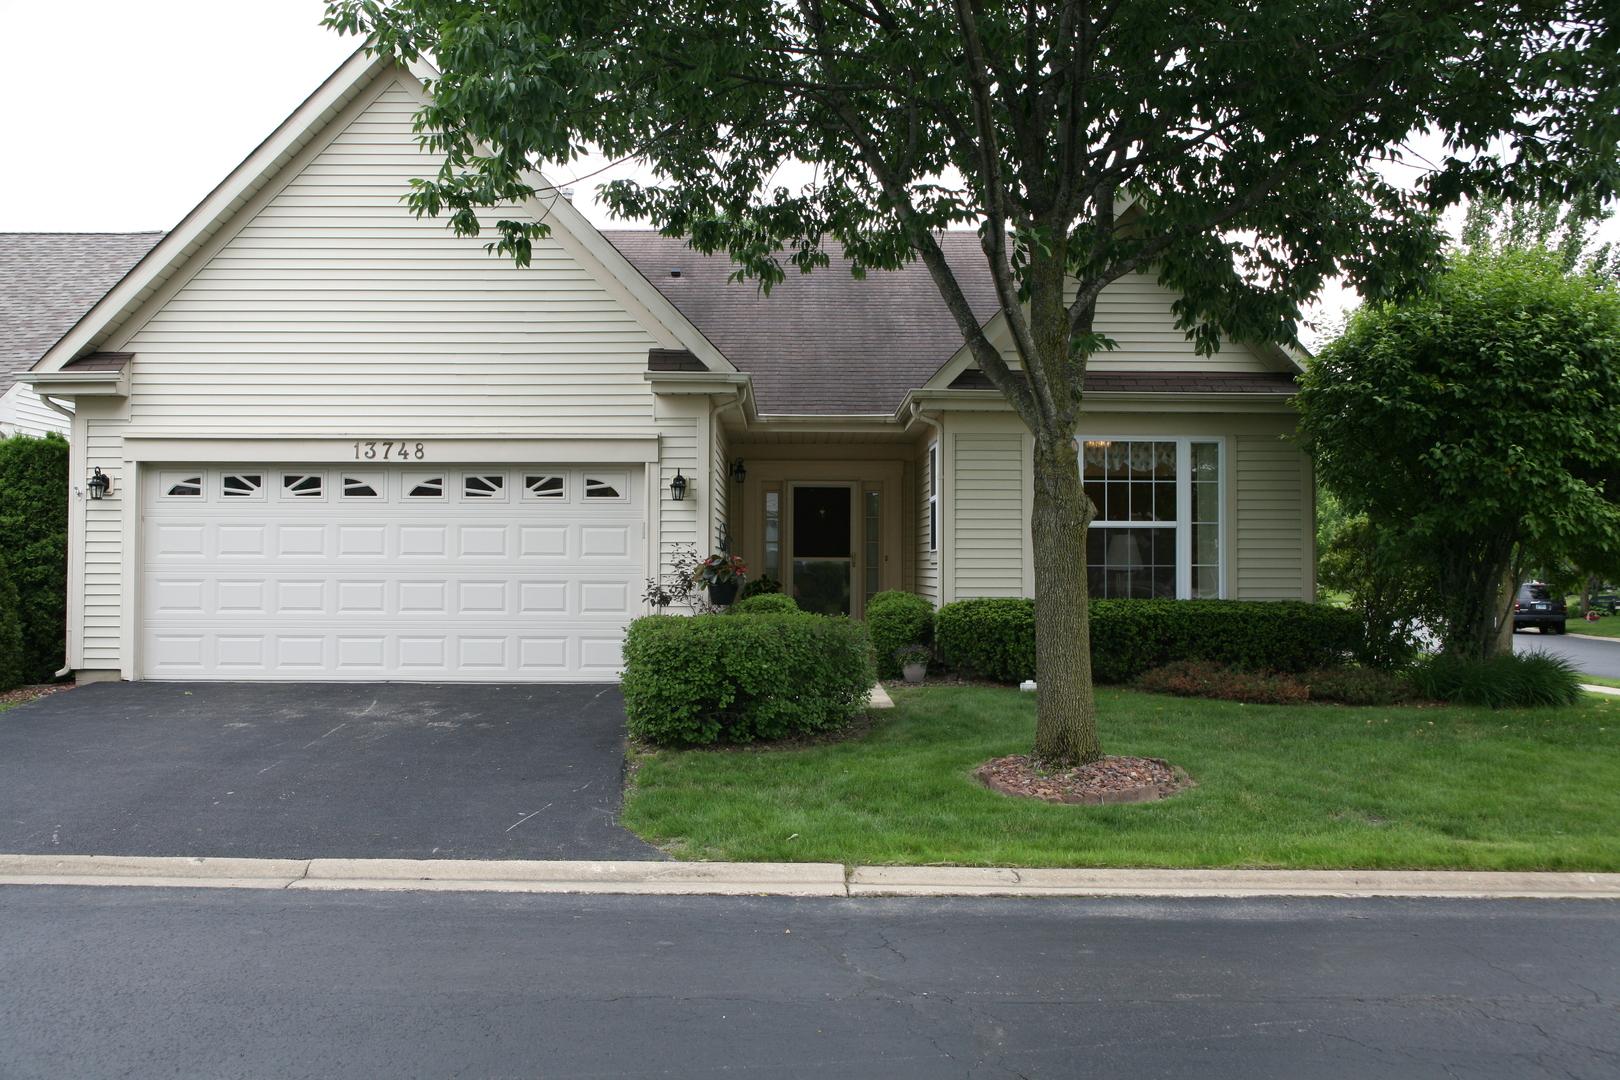 13748 South Redbud Drive, PLAINFIELD, Illinois